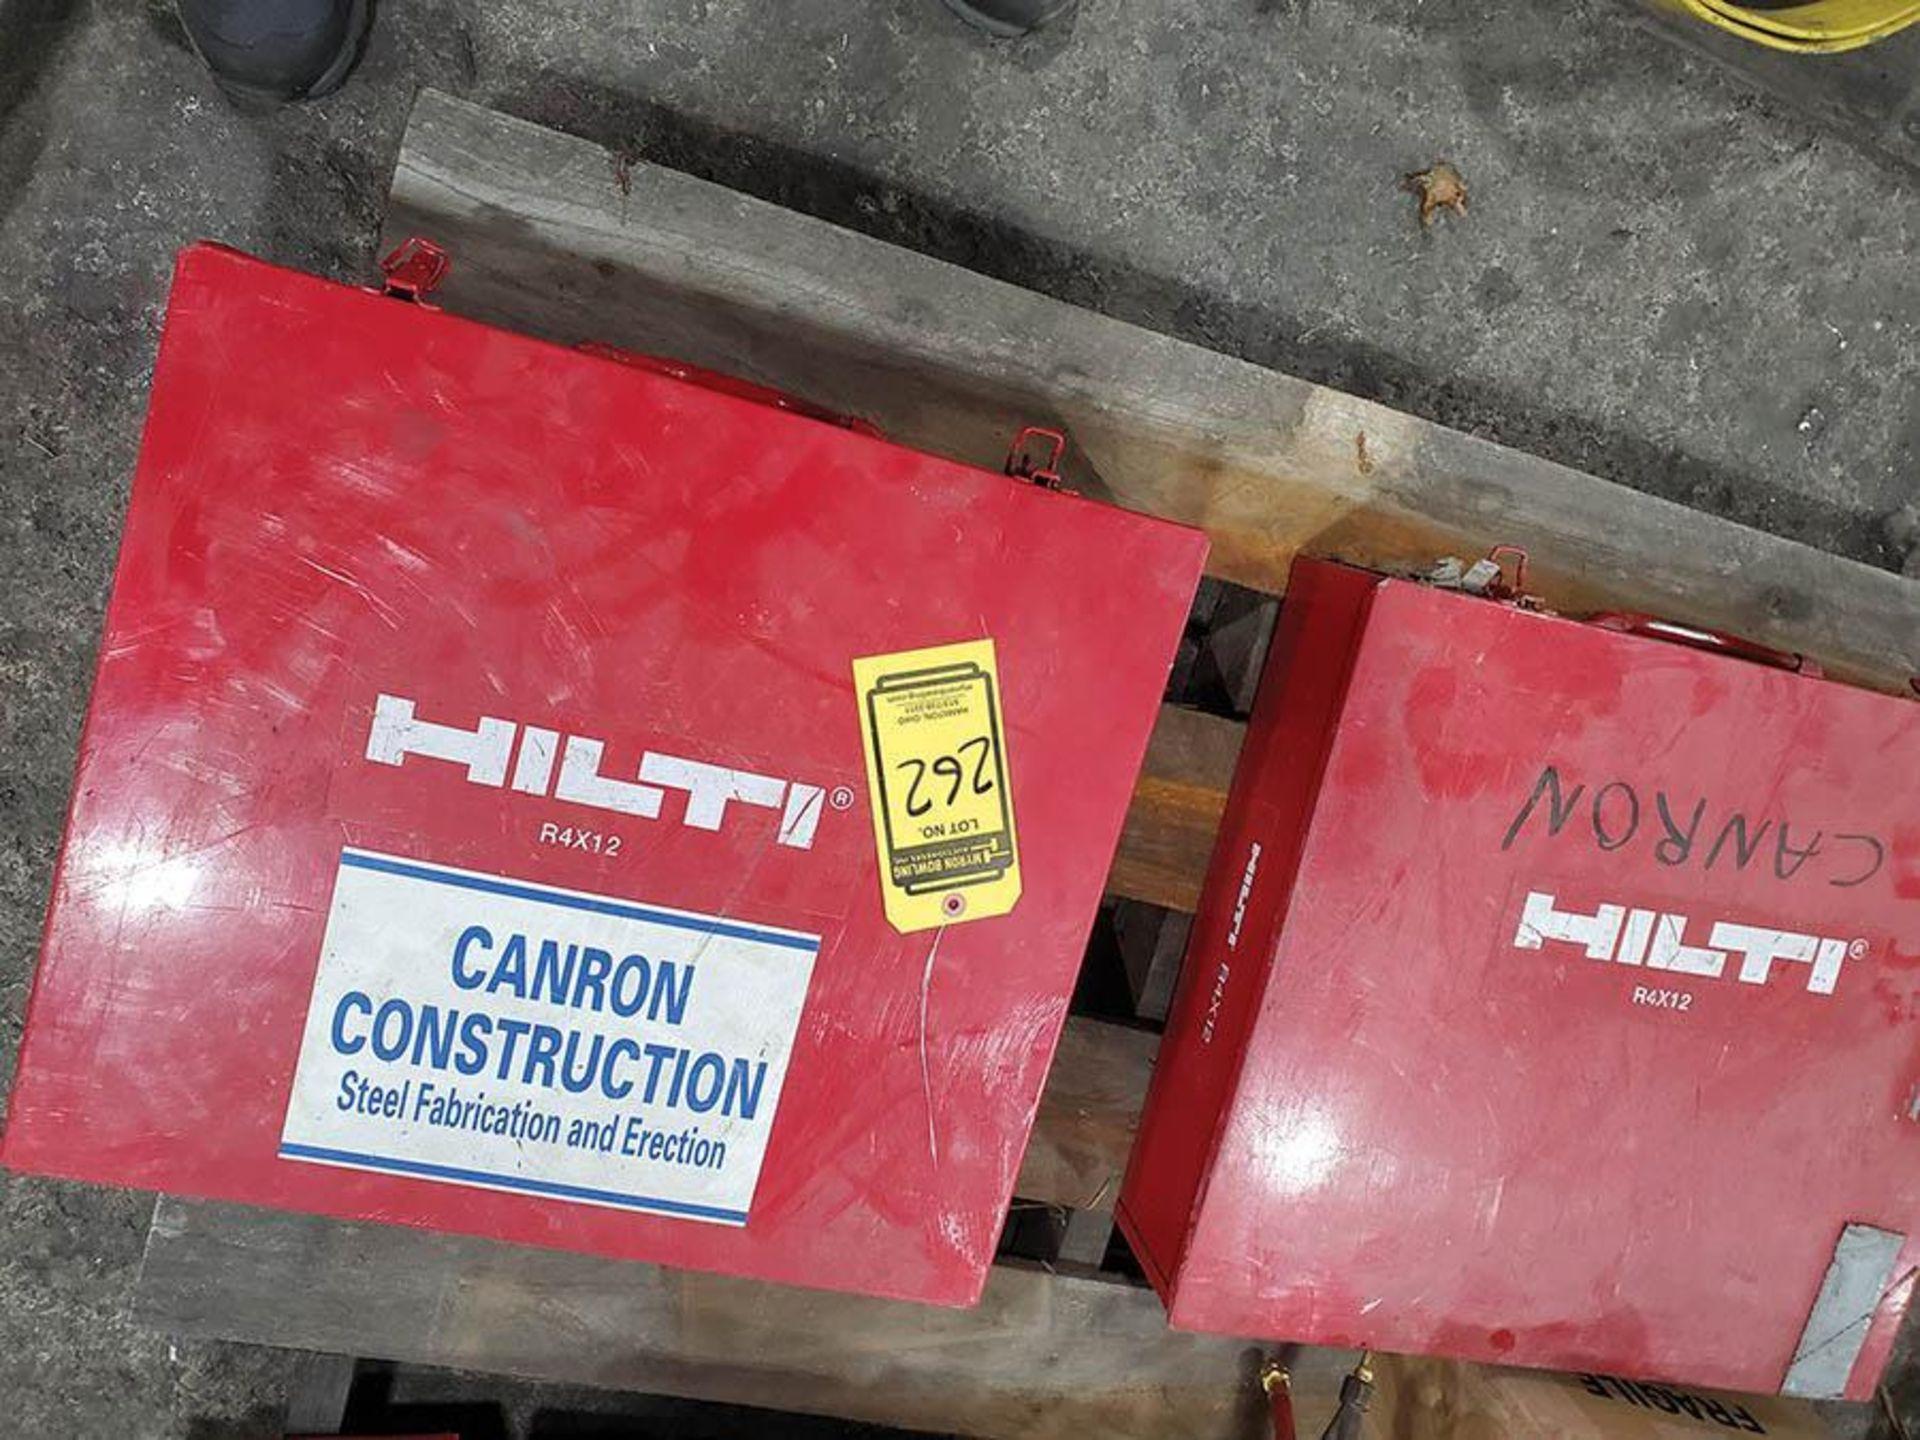 LOT ON PALLET, (2) HILTI R4X12 PNEUMATIC CONCRETE STEEL NAILERS